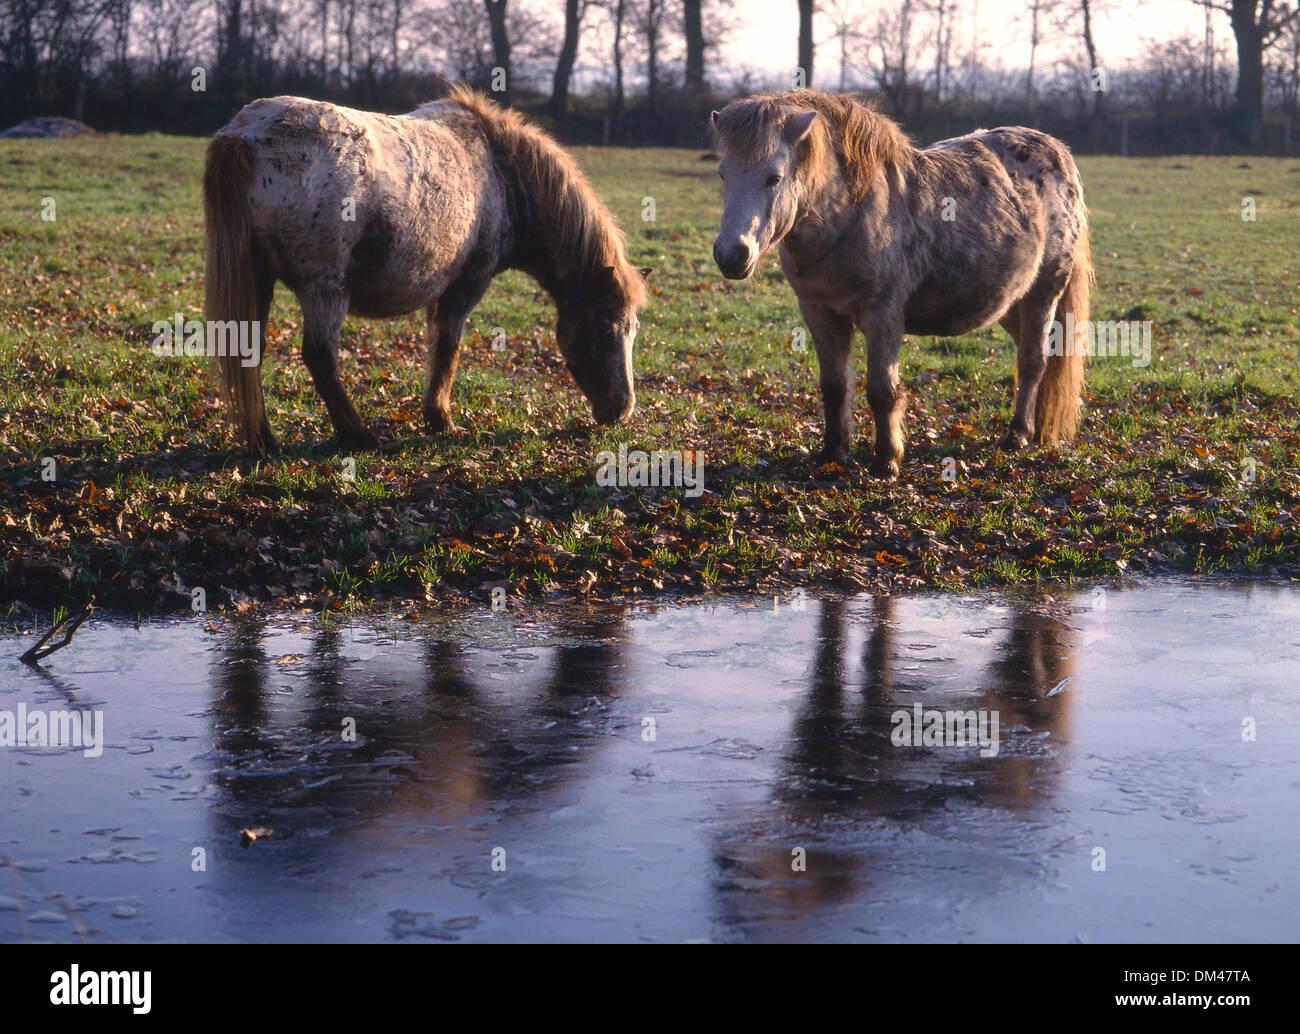 Horses on frozen lake, Pferde am zugefrorenen See - Stock Image